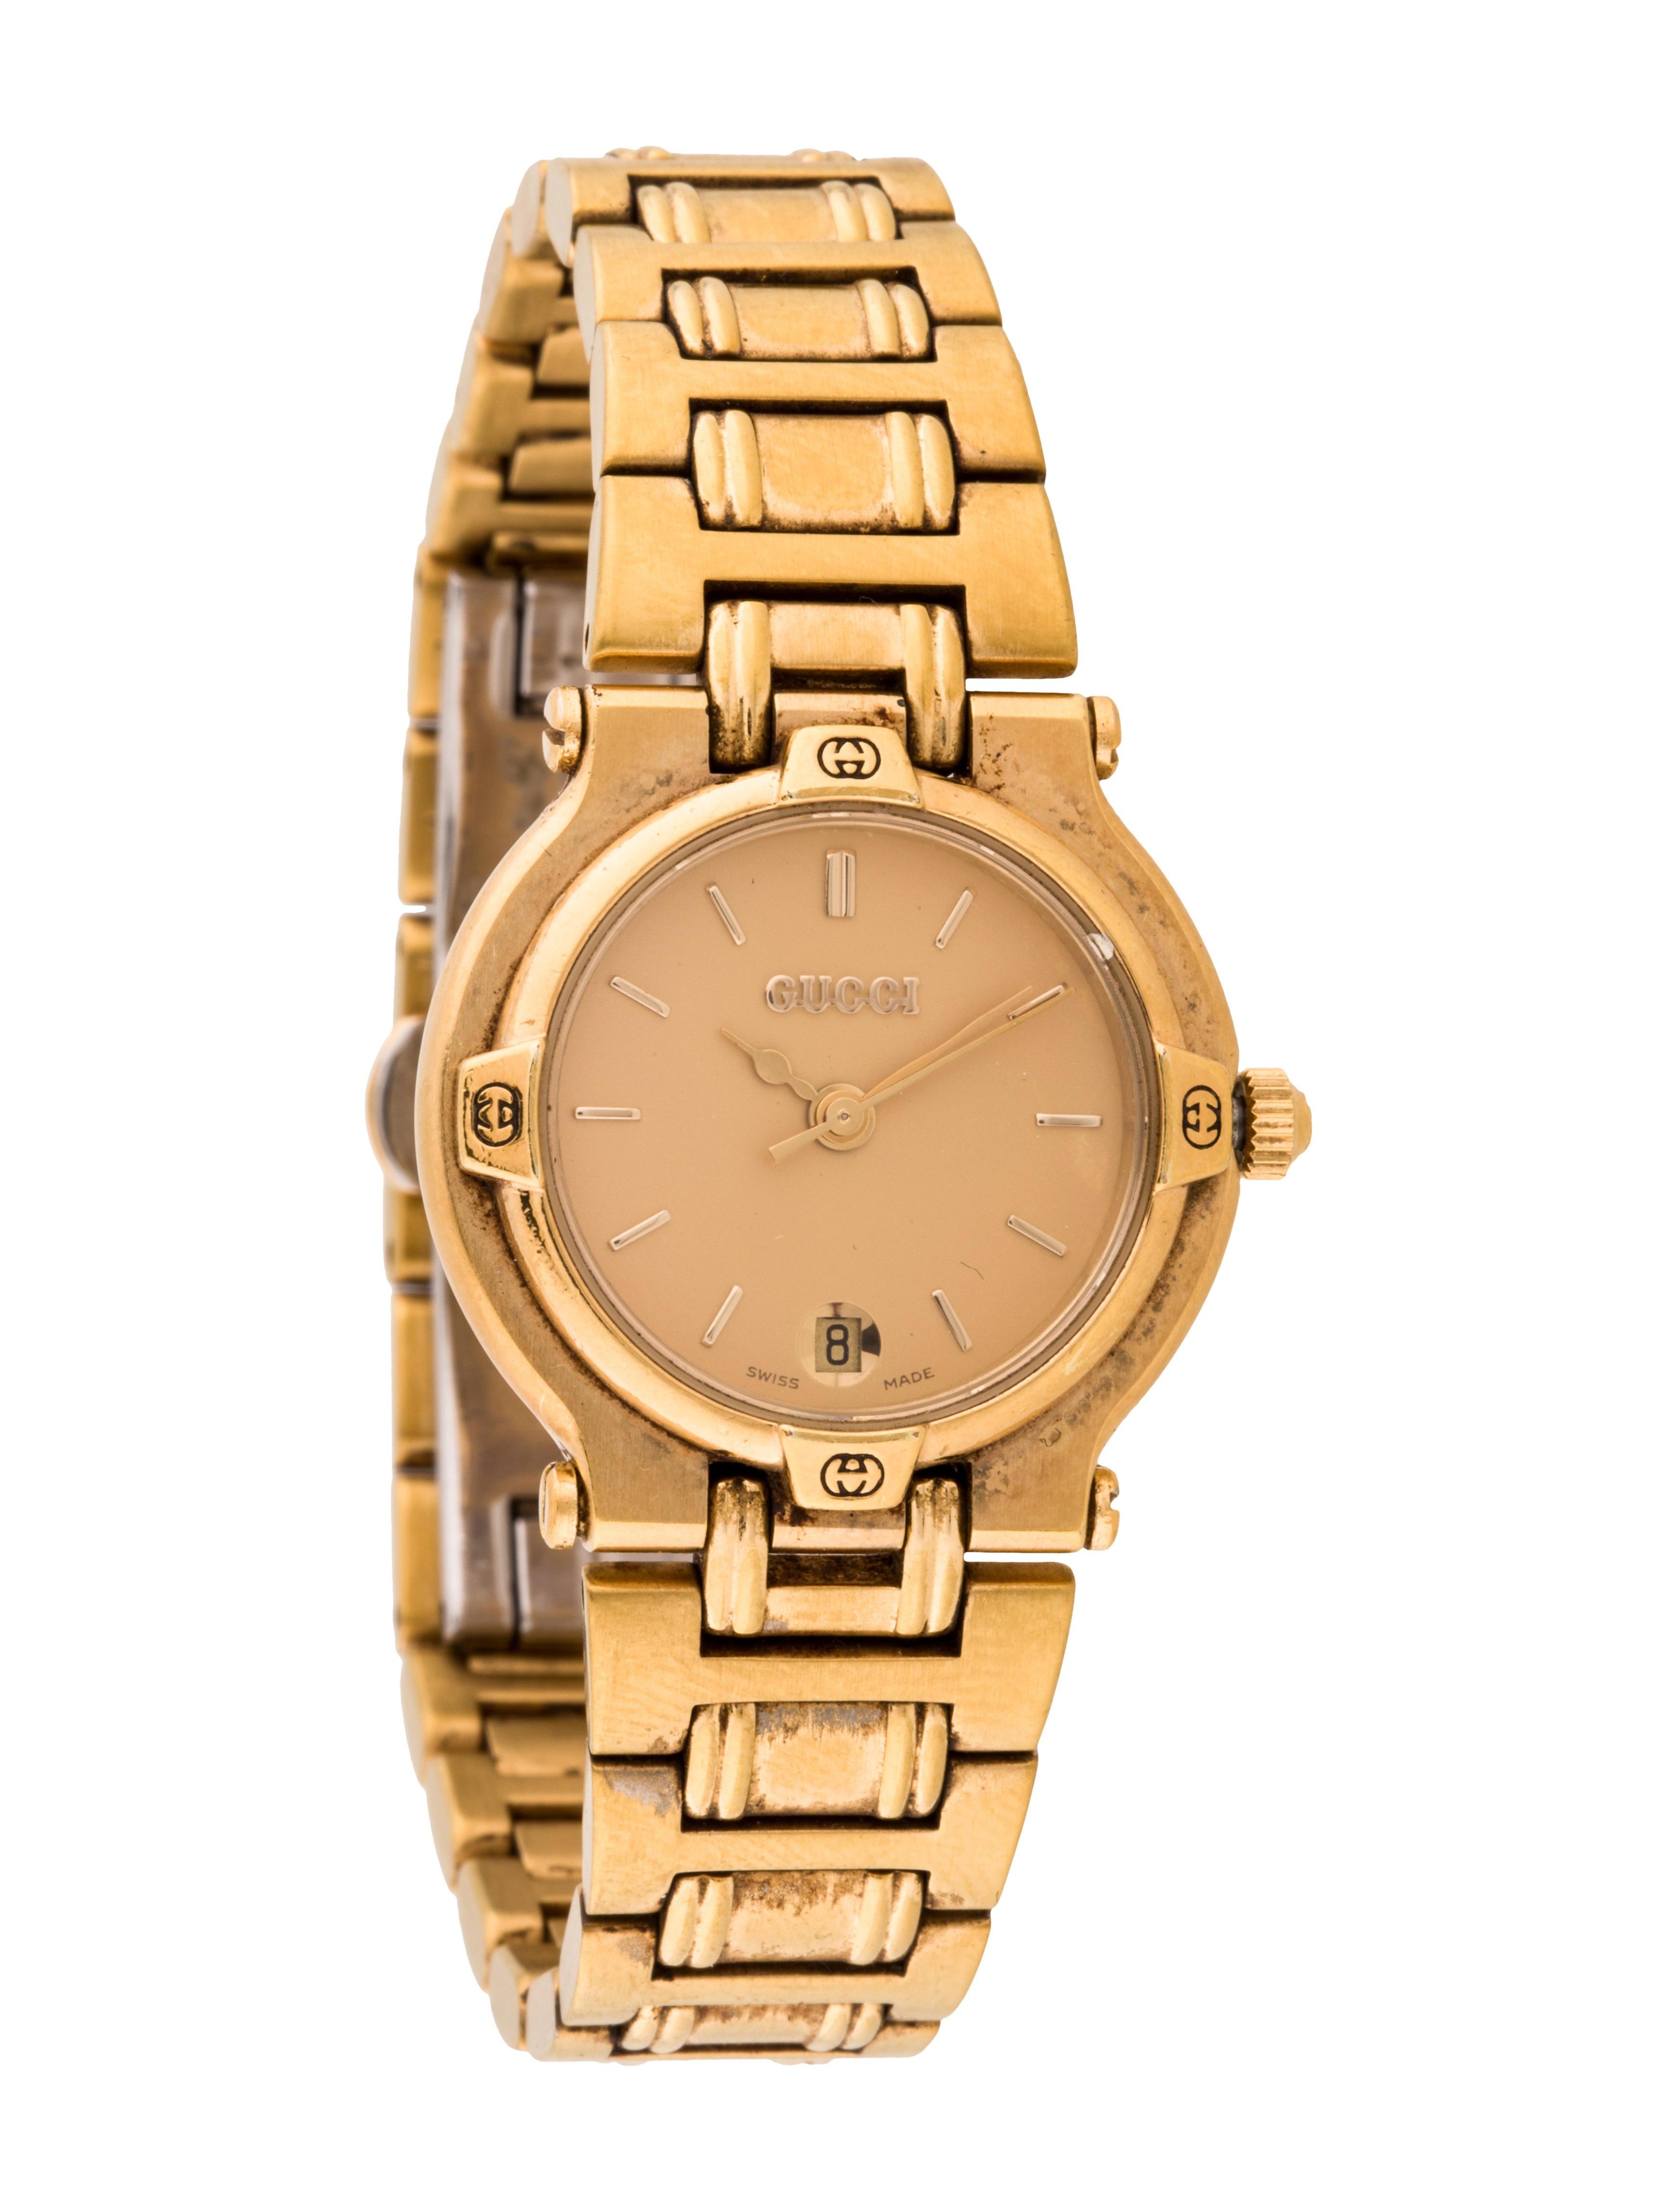 7899c0be4e2 Gucci 9200L Watch - Bracelet - GUC70474